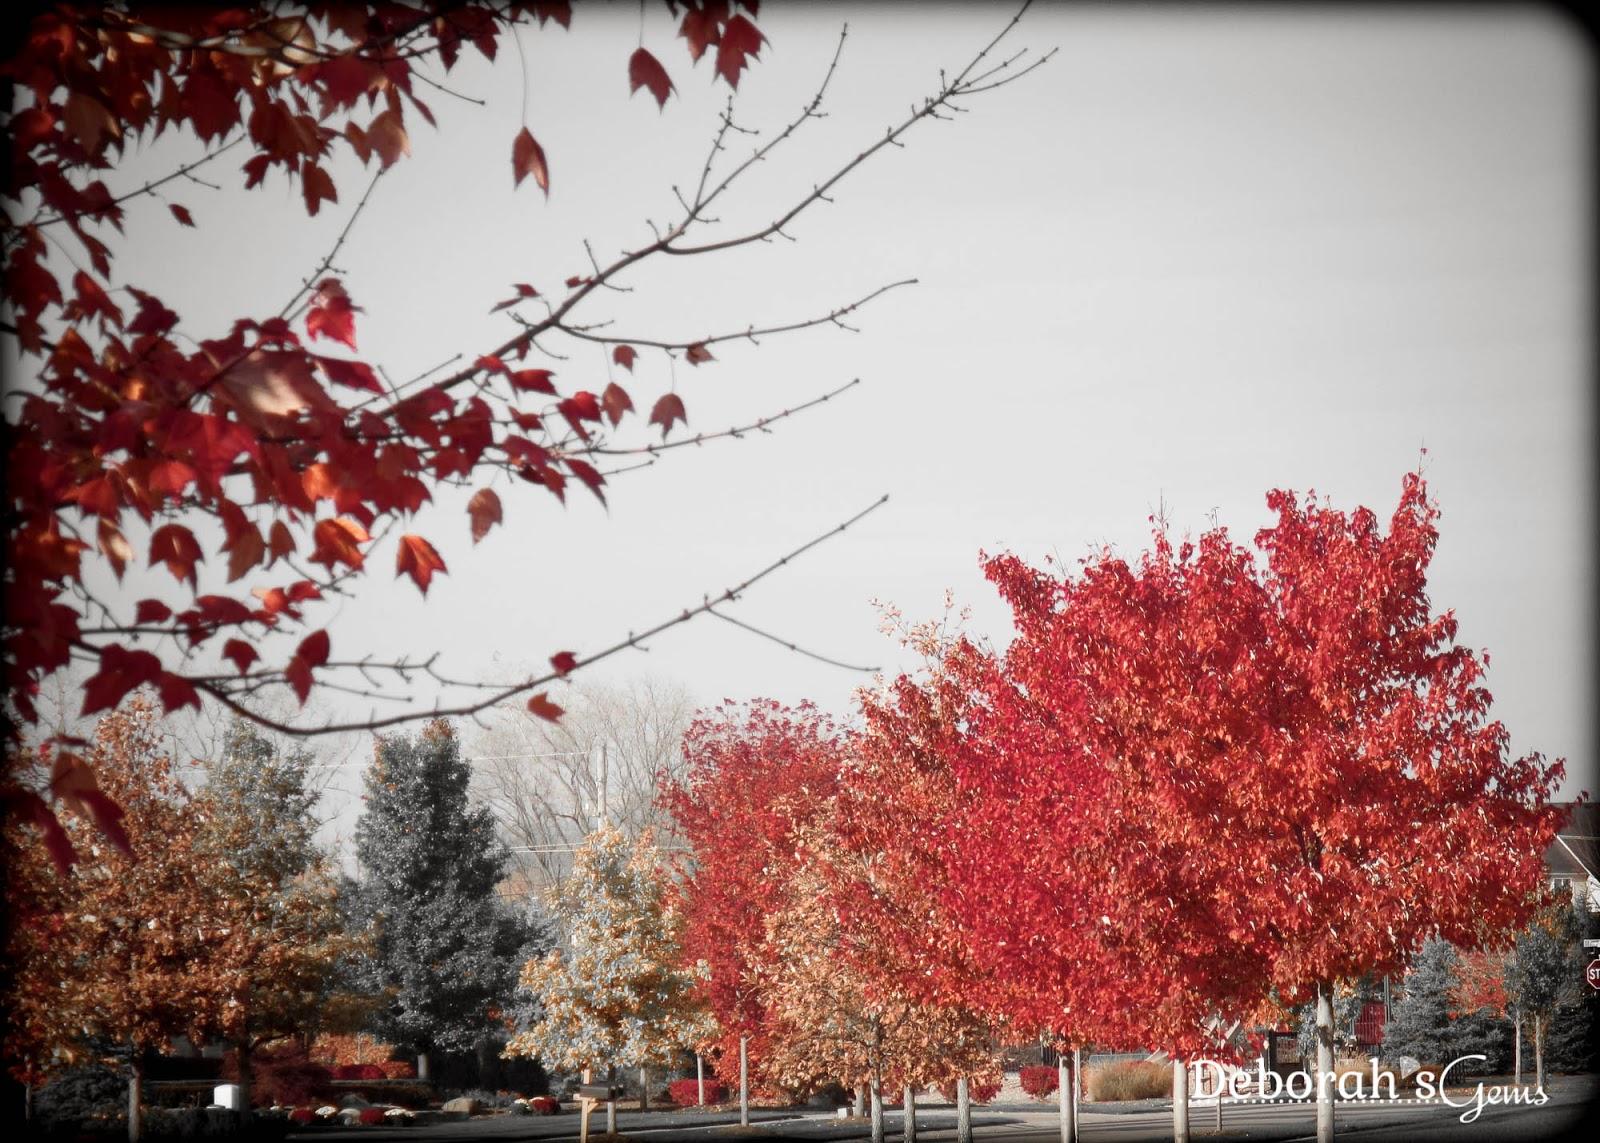 Autumn Glory 3 - photo by Deborah Frings - Deborah's Gems